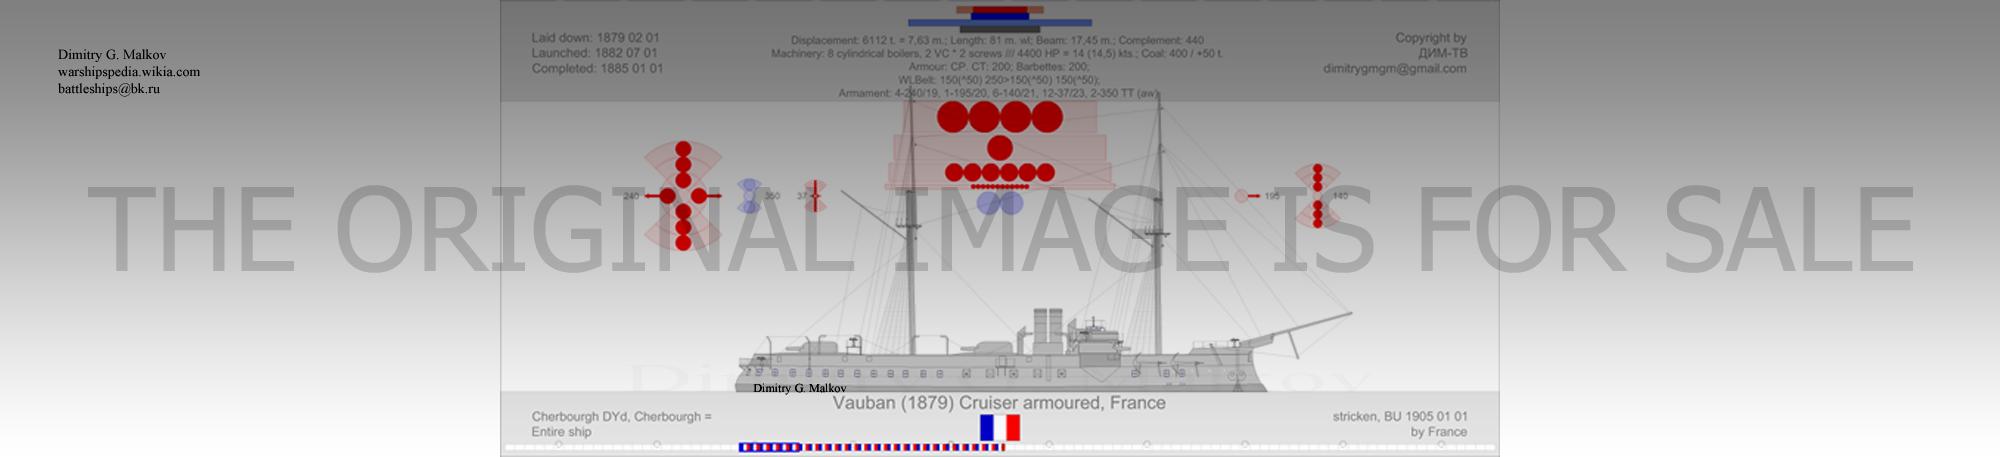 Mes dessins de navires français et de construction française - Page 2 Ca-18713